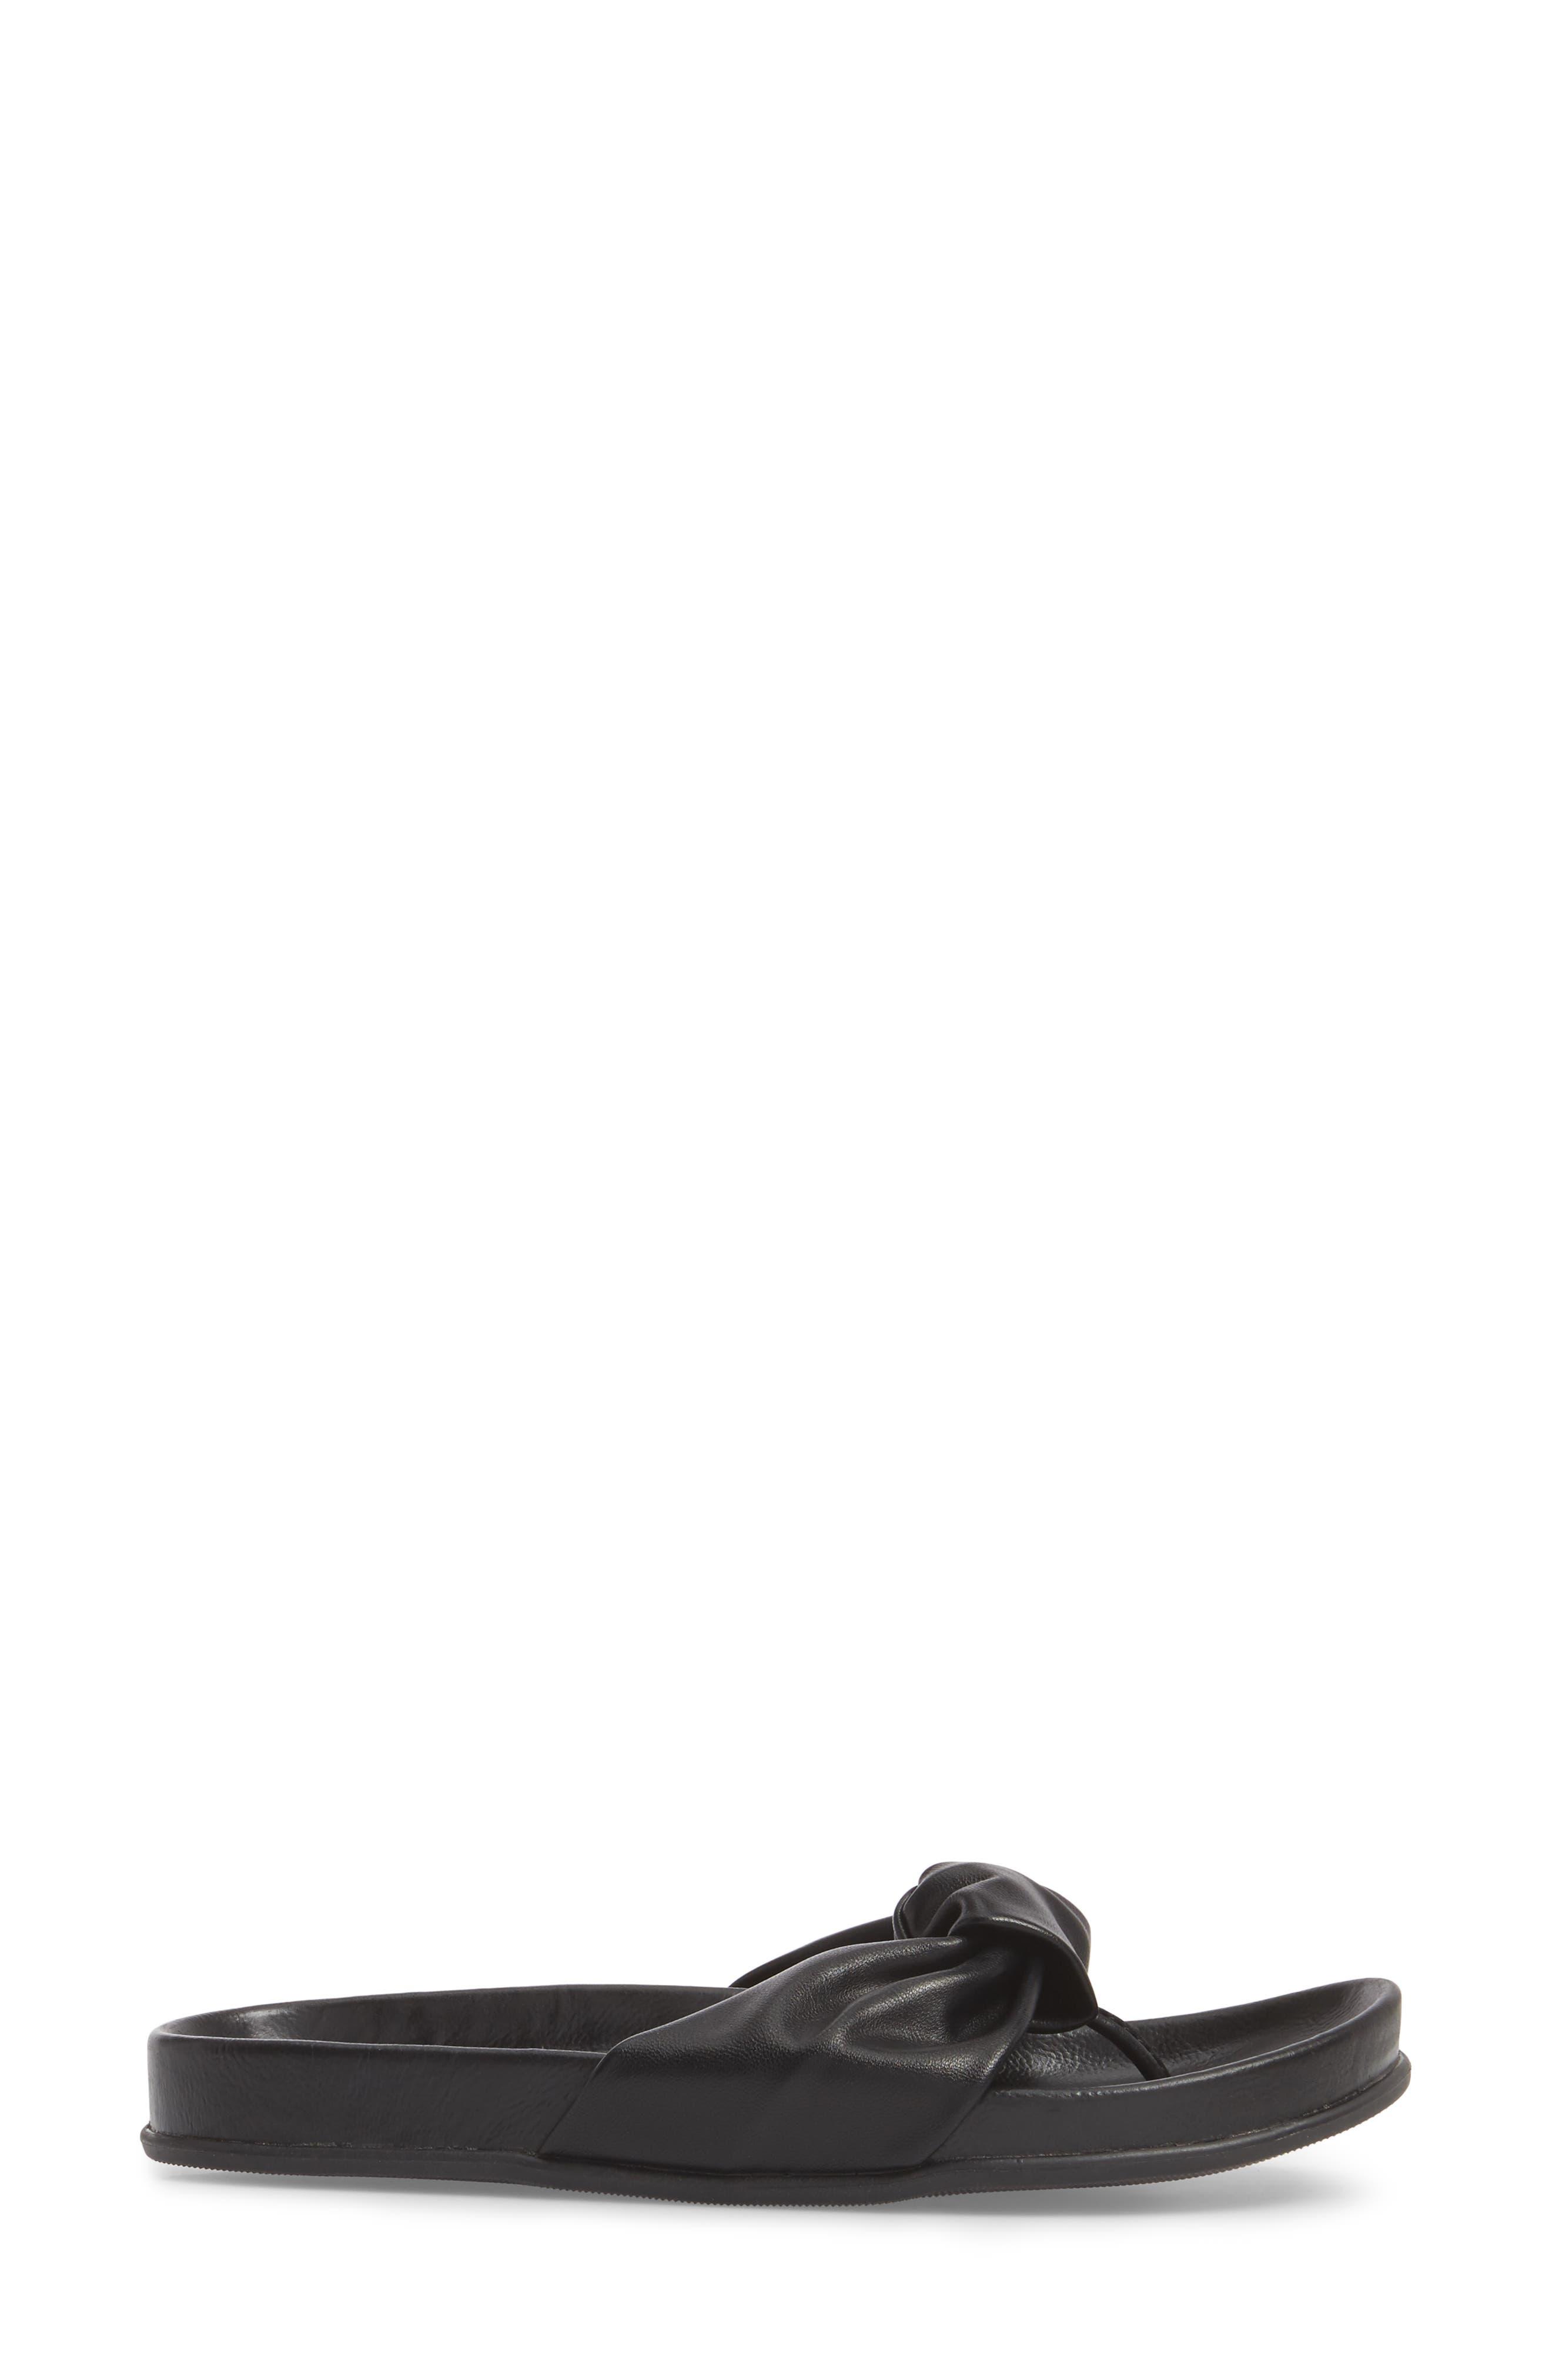 Glaze Bow Sandal,                             Alternate thumbnail 3, color,                             BLACK